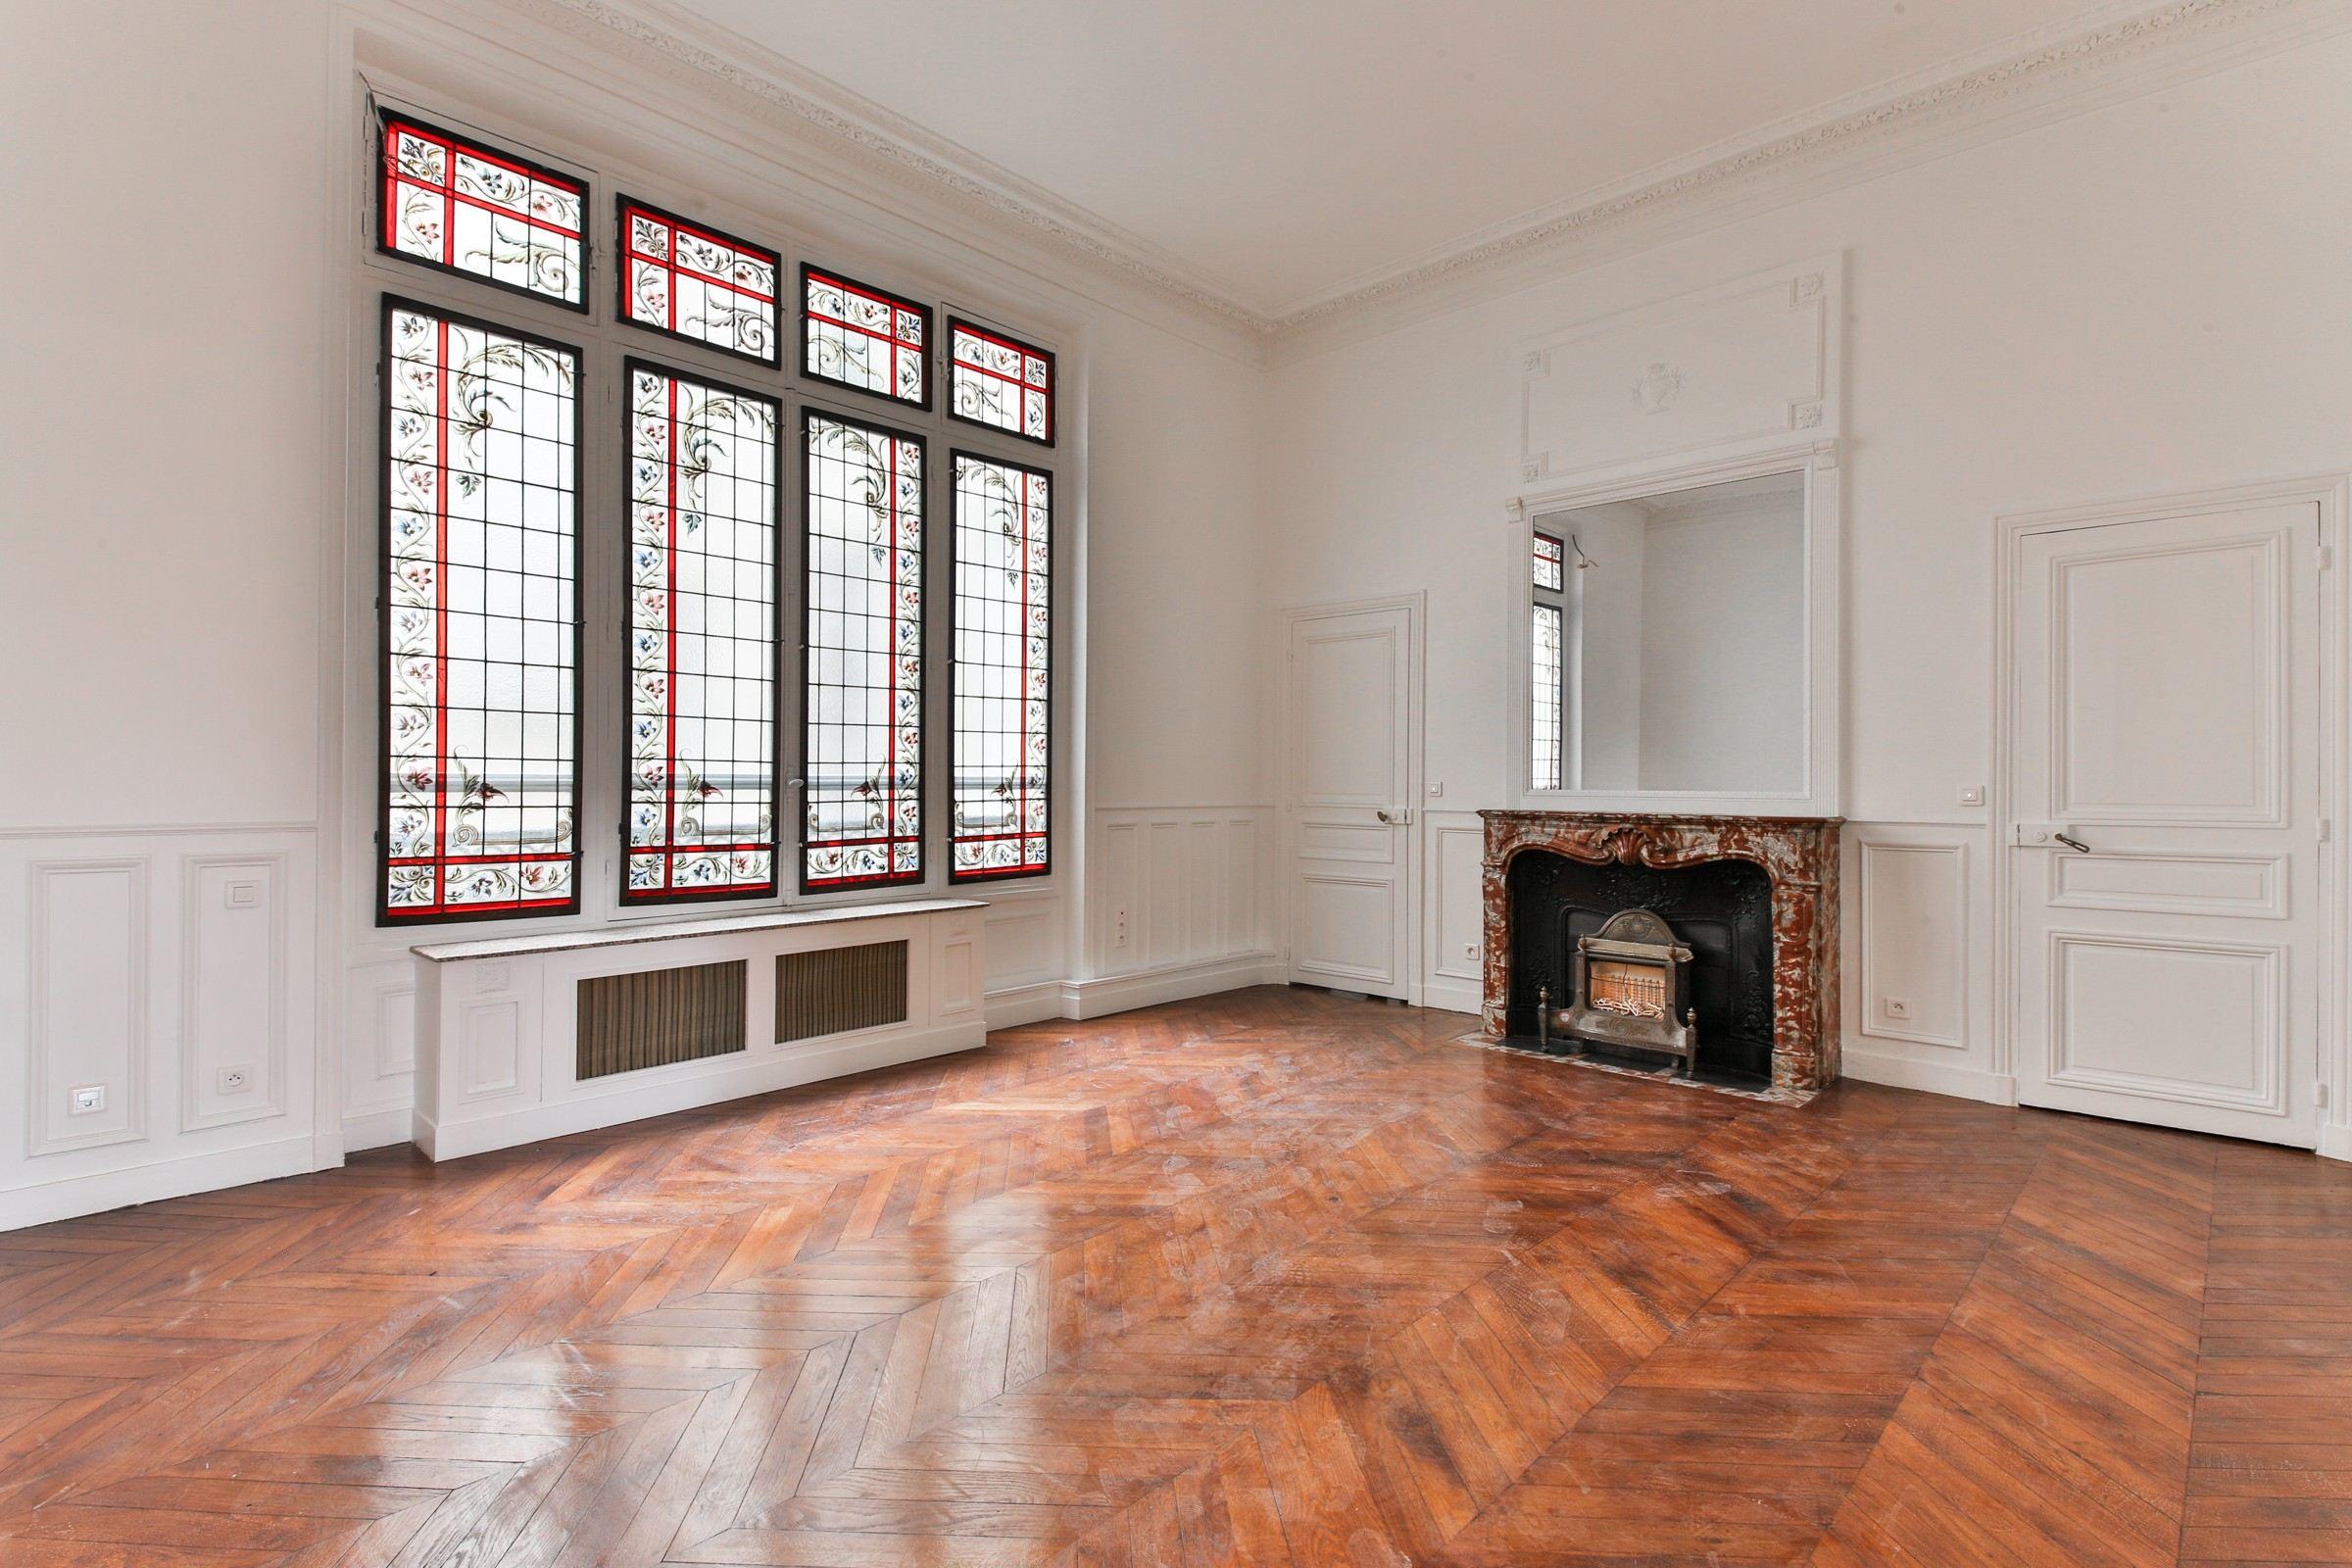 Apartamento por un Venta en Paris 16 - A 290 sq.m apartment. Eiffel Tower view Paris, Paris 75016 Francia